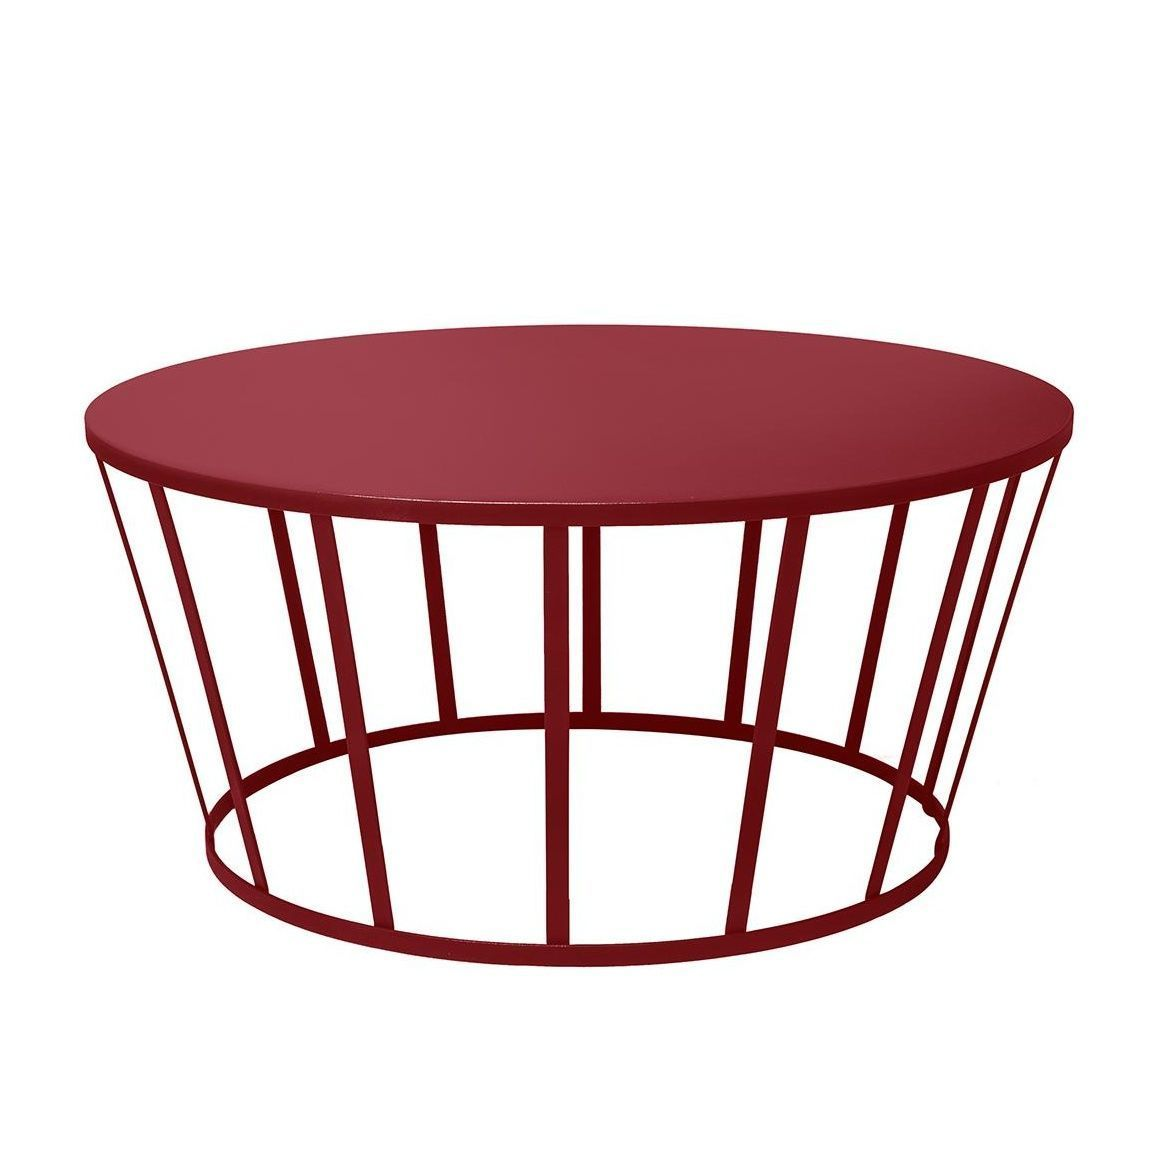 Hollo Coffee Table Ø70cm   Burgundy Red/H 33cm